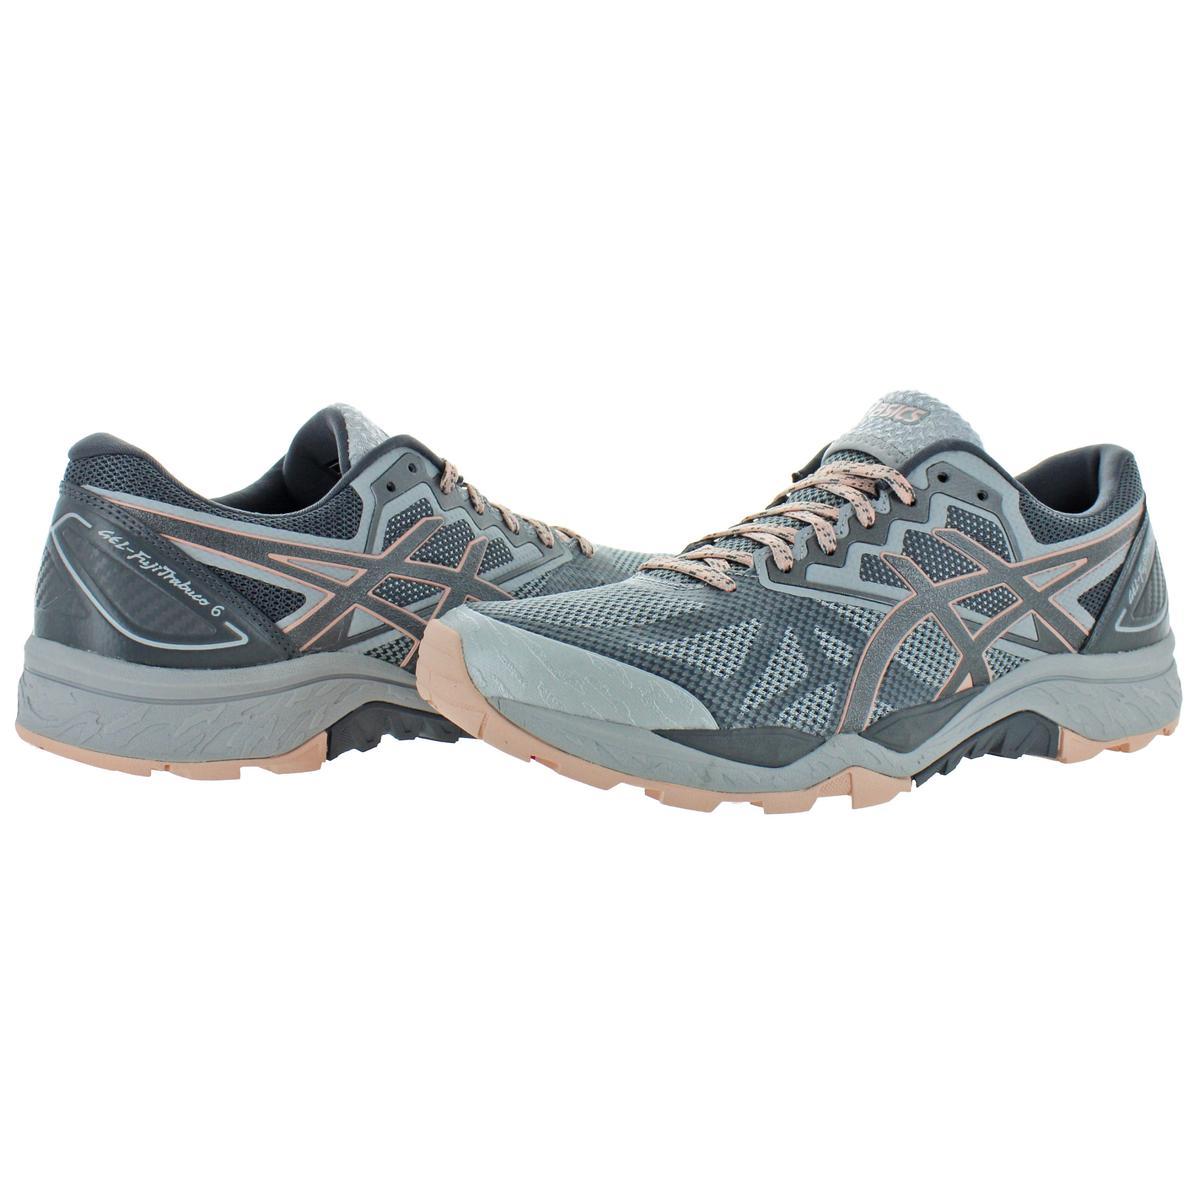 Asics-Womens-Gel-Fuji-Trabuco-6-Athletic-Running-Shoes-Sneakers-BHFO-7368 thumbnail 8